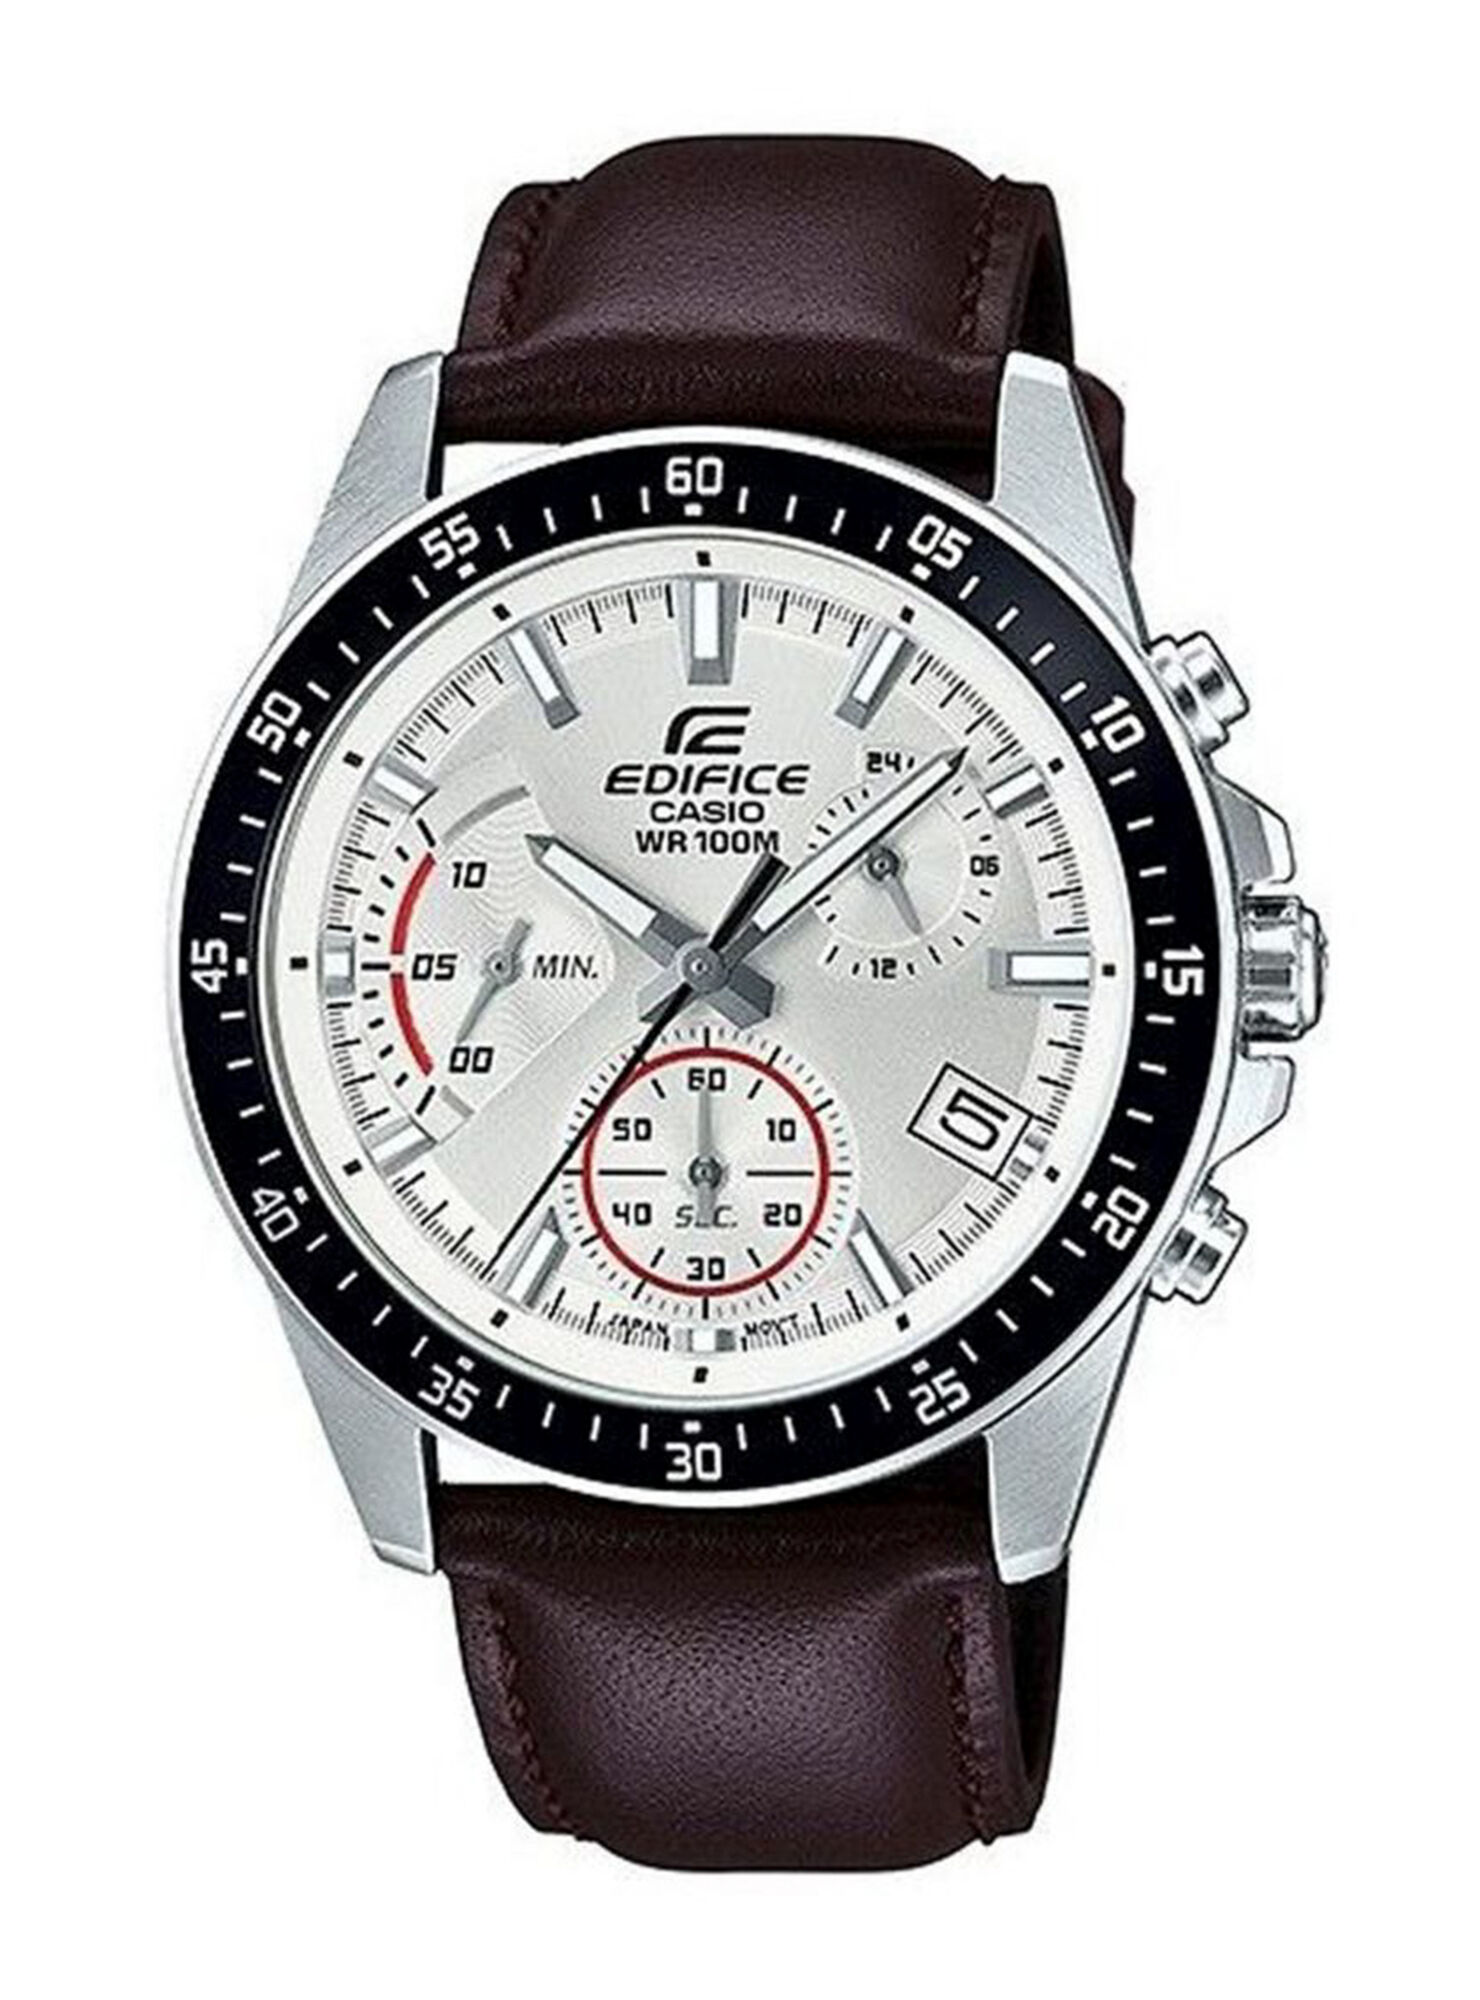 27944dd92c6a Reloj Análogo Edifice EFV-540L-7AVUDF Hombre en Relojes